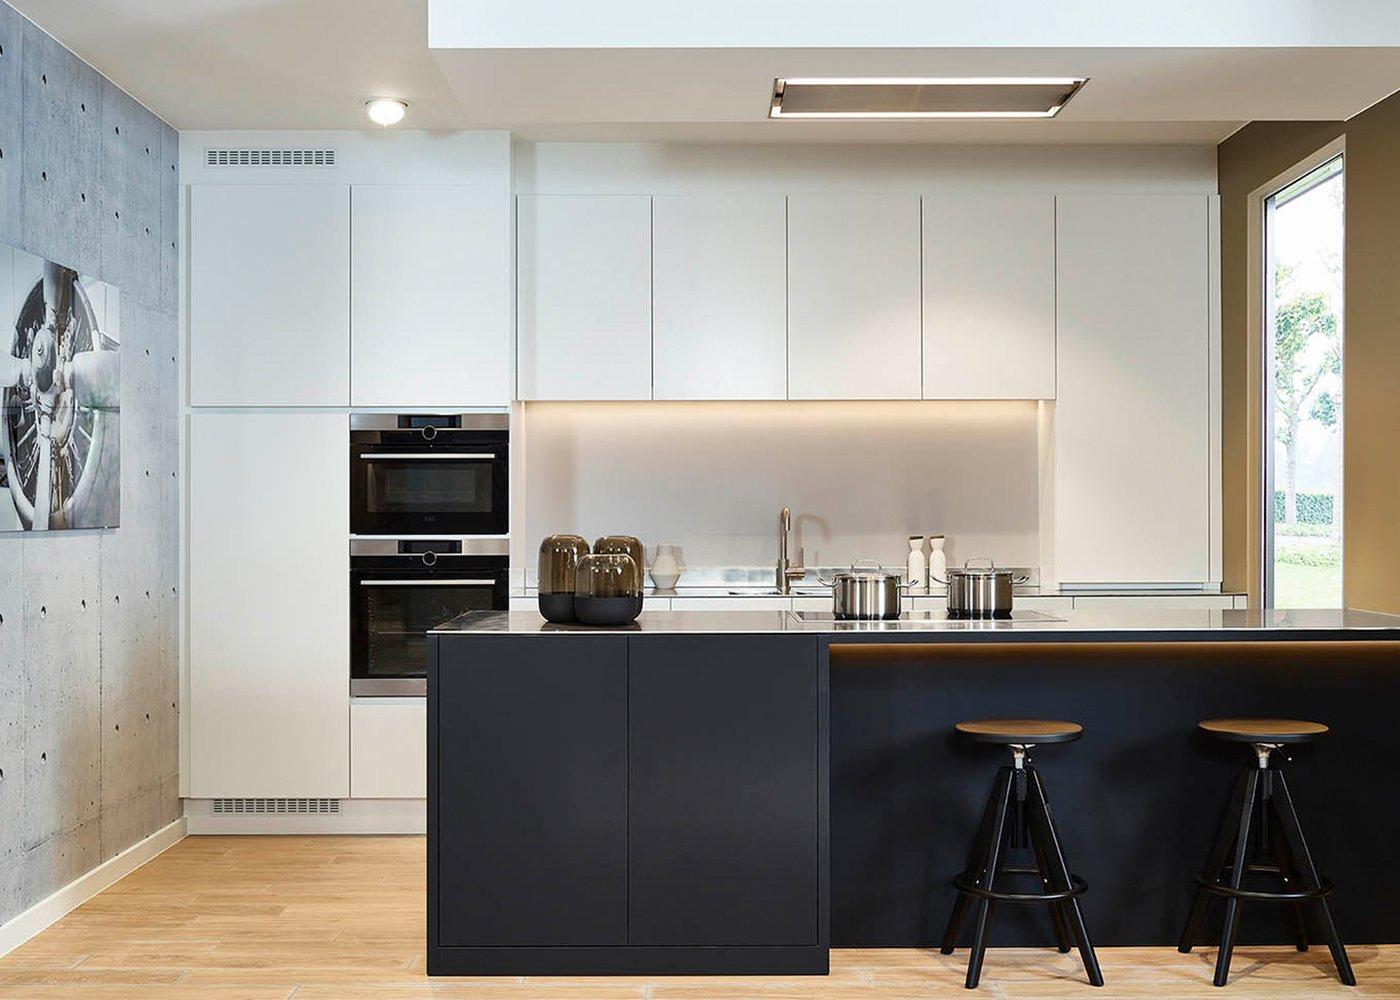 Moderne greeploze keuken in zwart-wit - Model Design